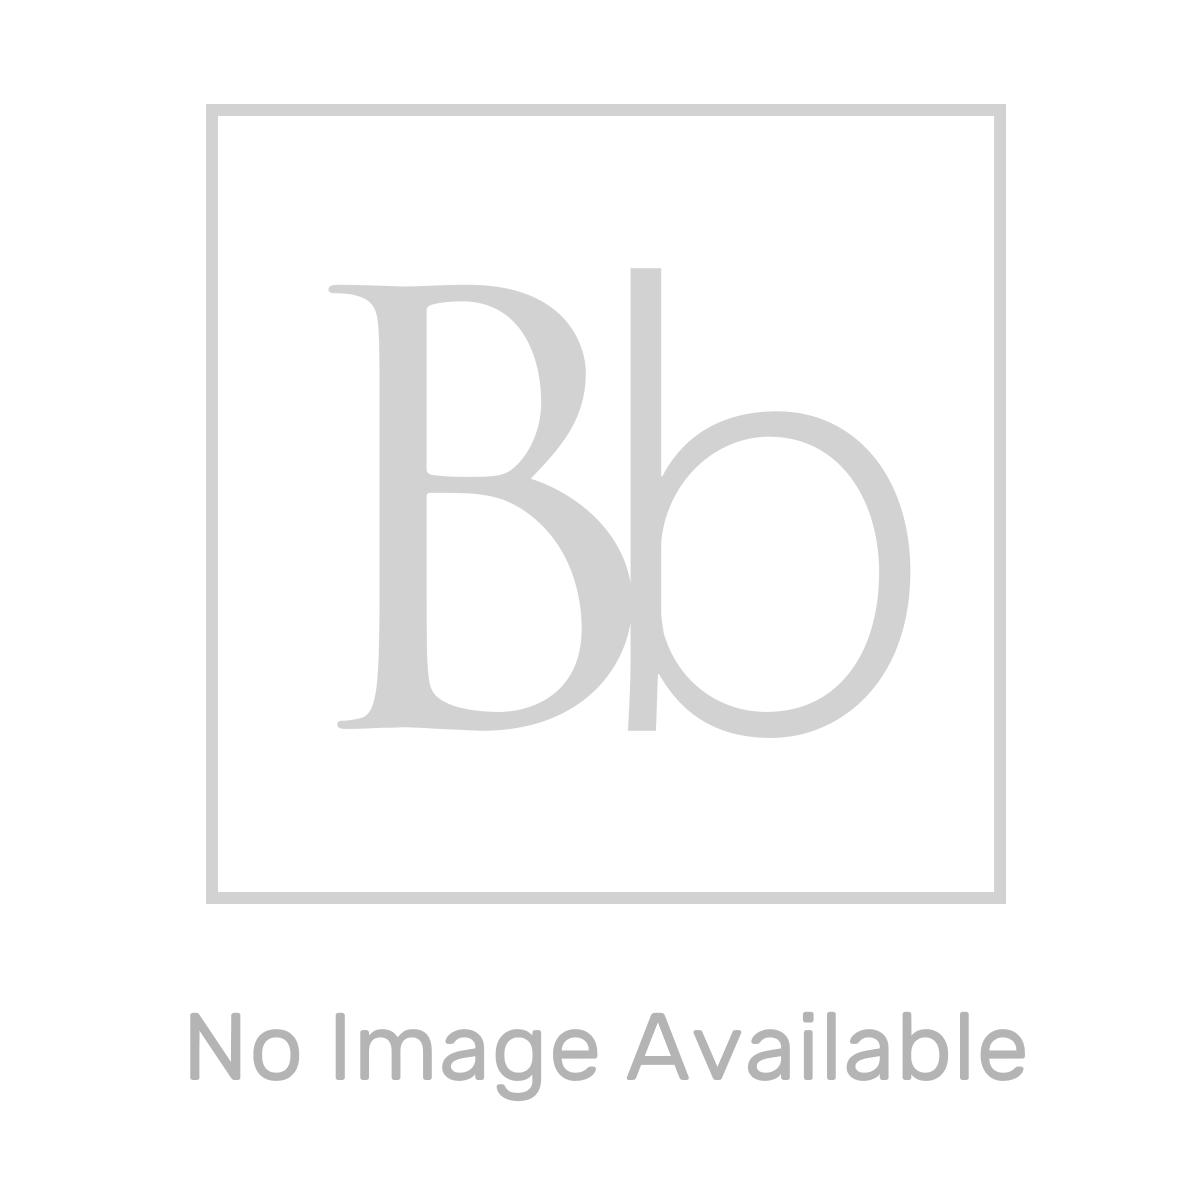 Aquadart White Slate Shower Tray 1600 x 800